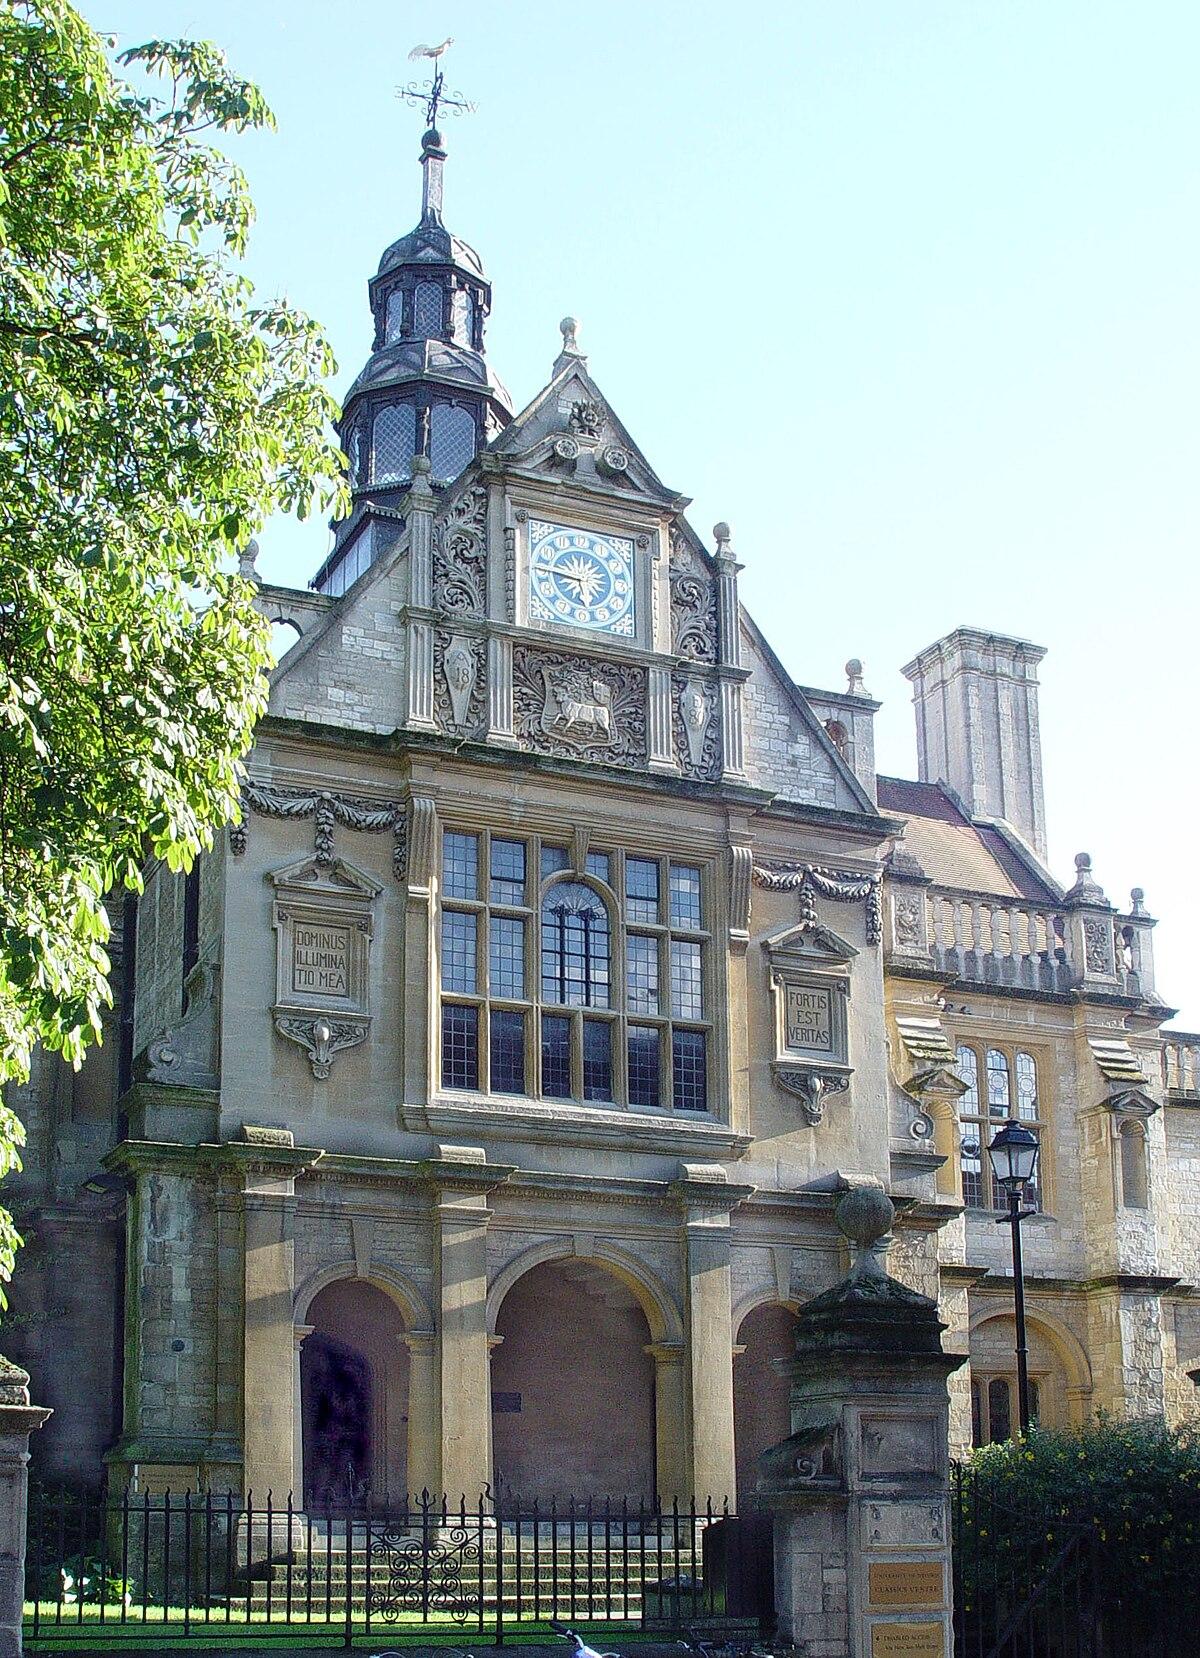 City Of Oxford High School For Boys